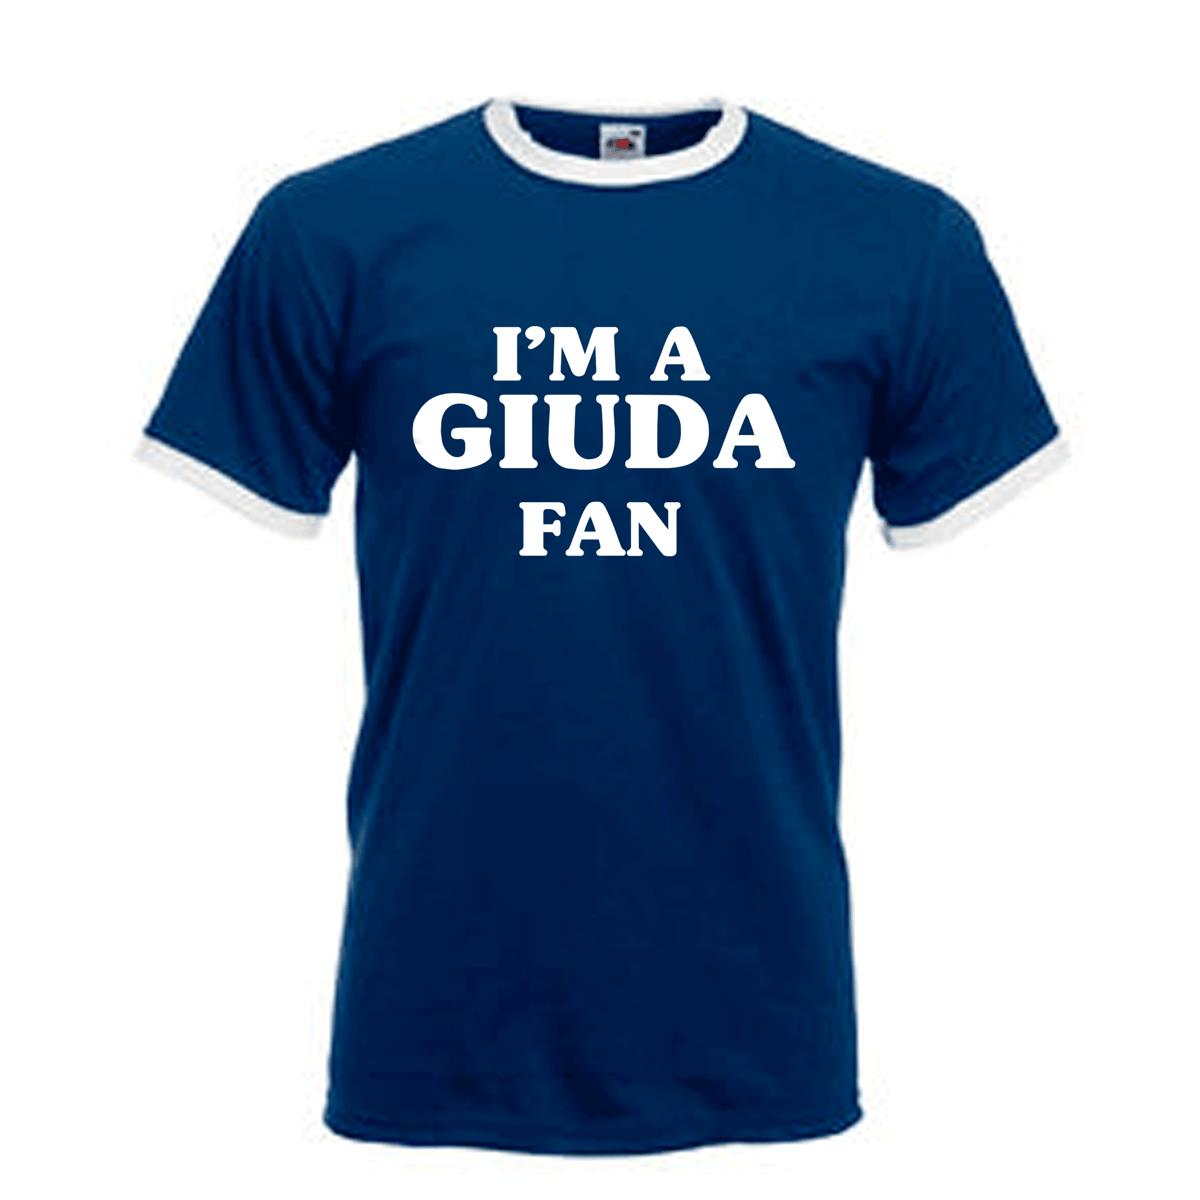 Image of T-shirt I'm a giuda fan